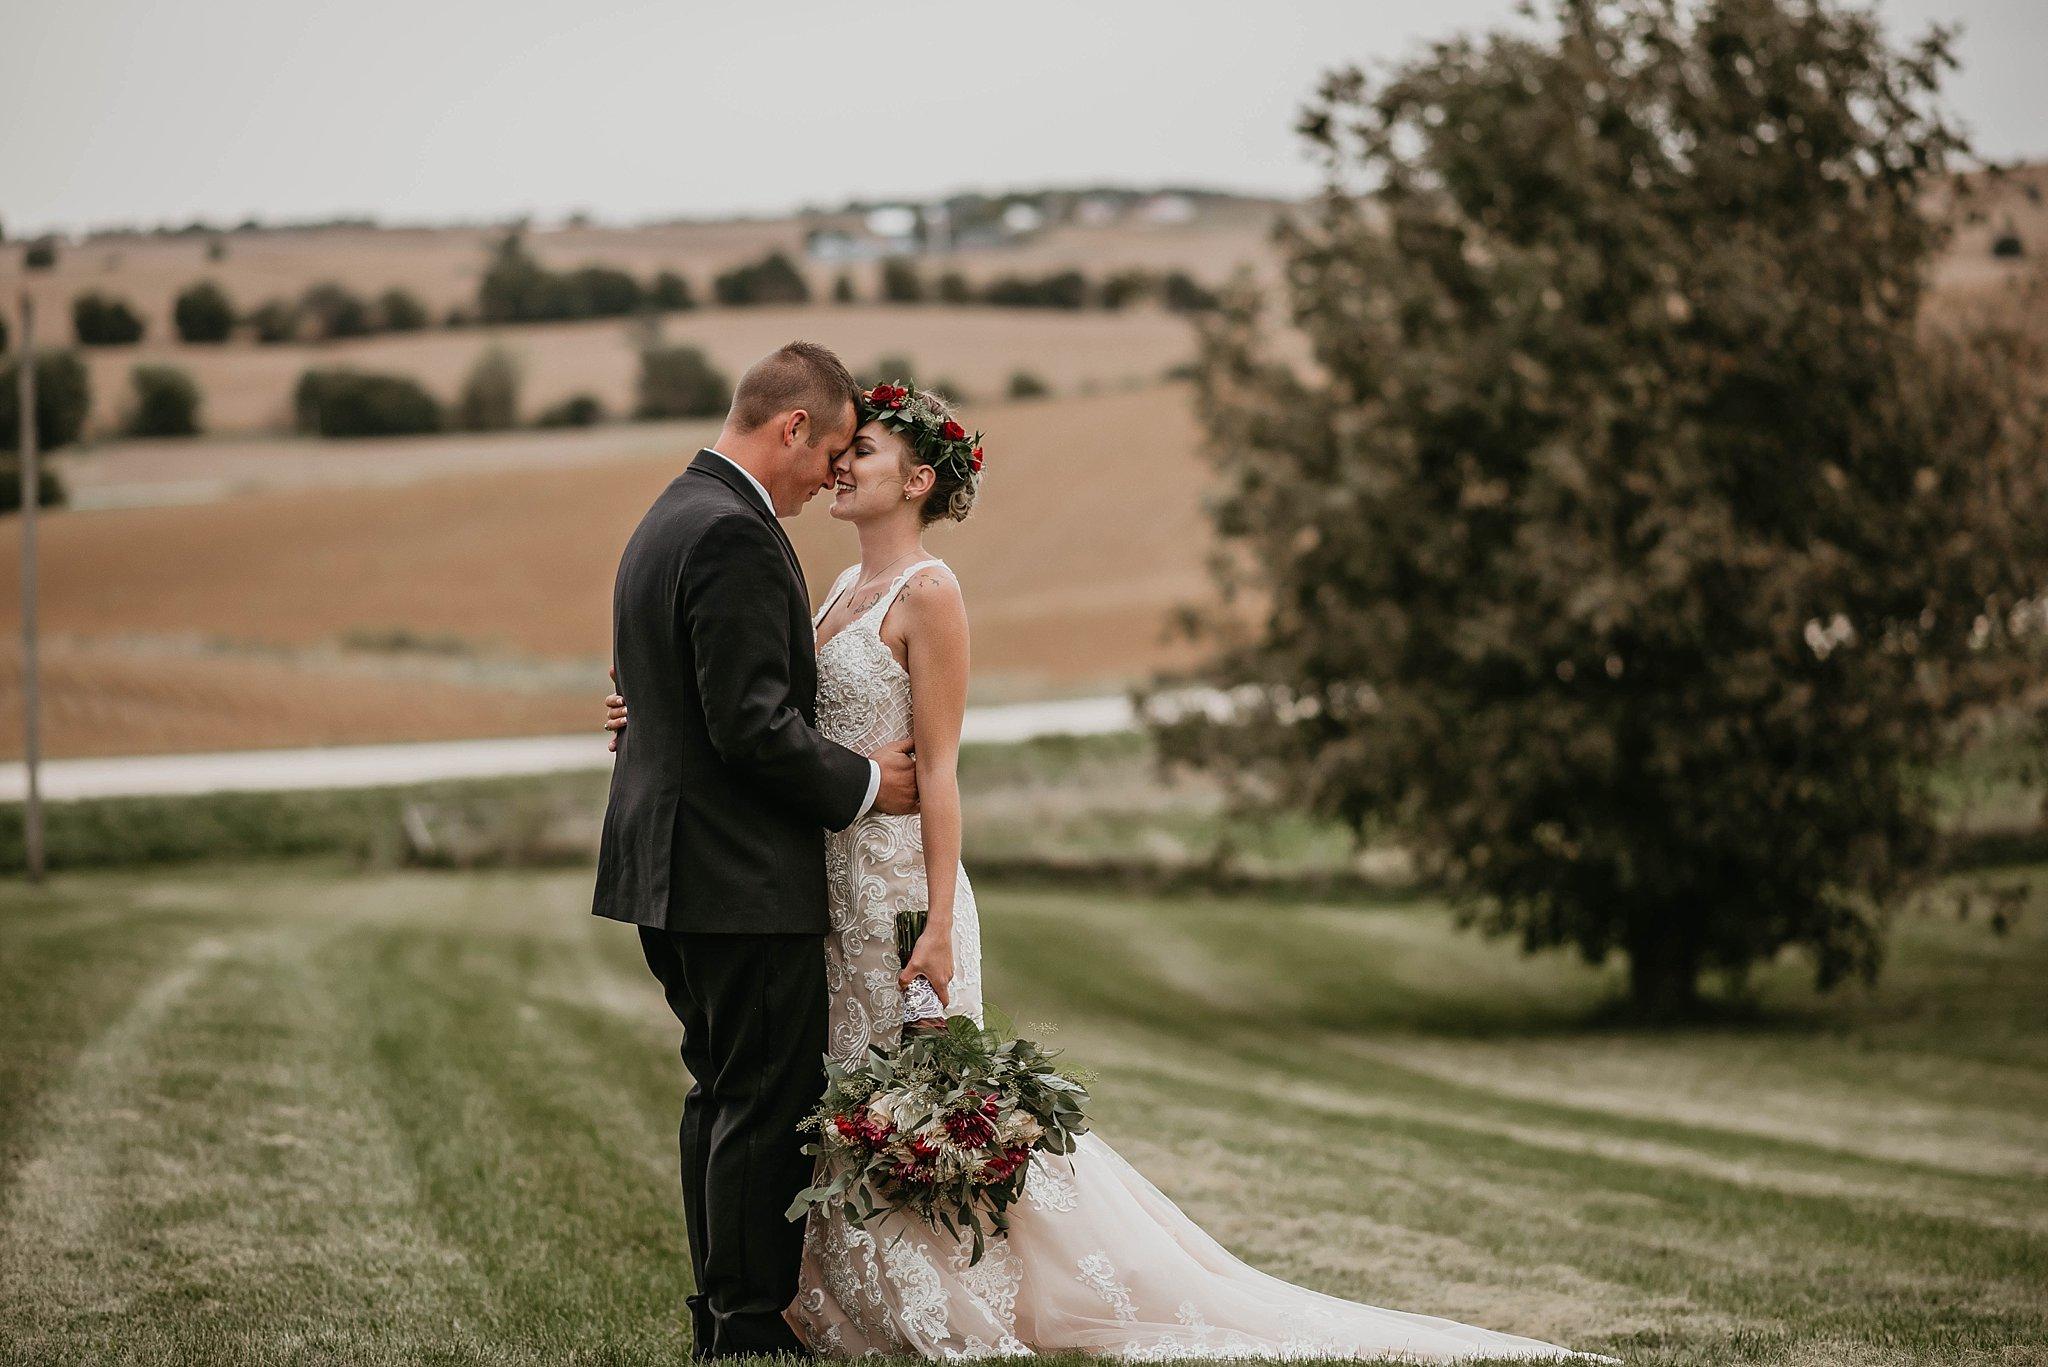 DesMoines-Iowa-Wedding-Photography-Destination-Photographer_0163.jpg